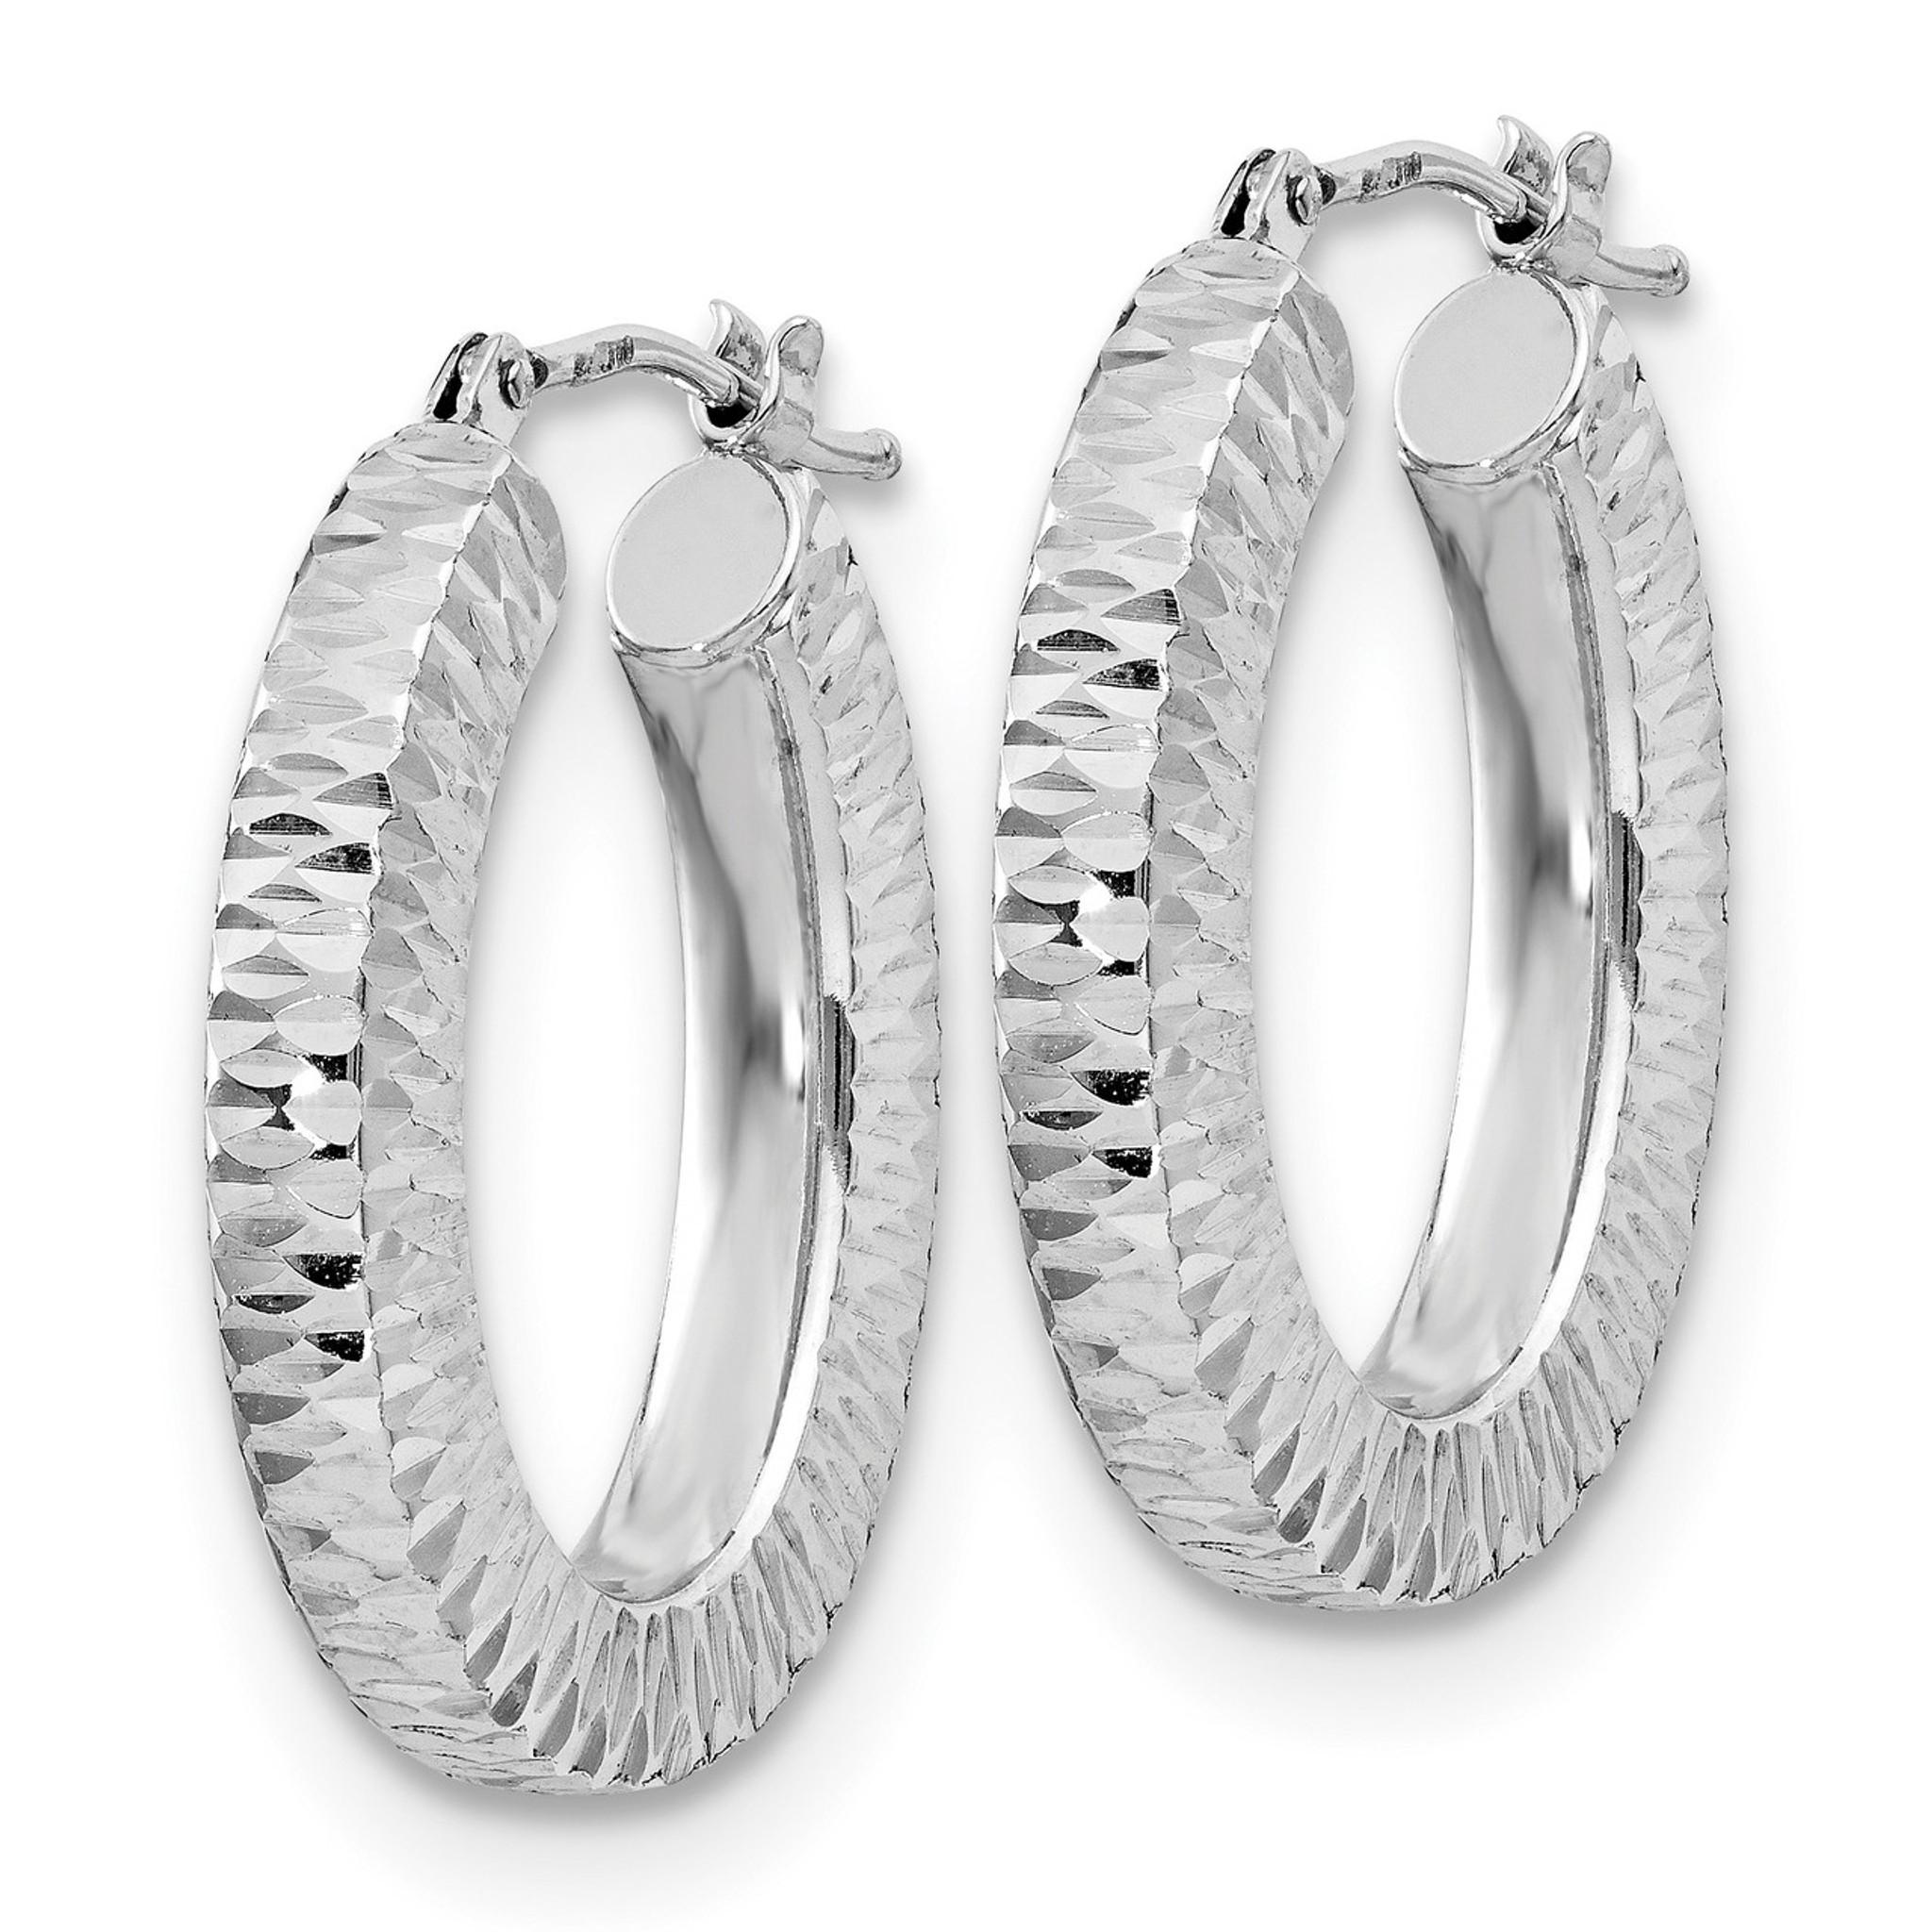 14k White Gold Diamond-cut Polished Oval Hoop Earring